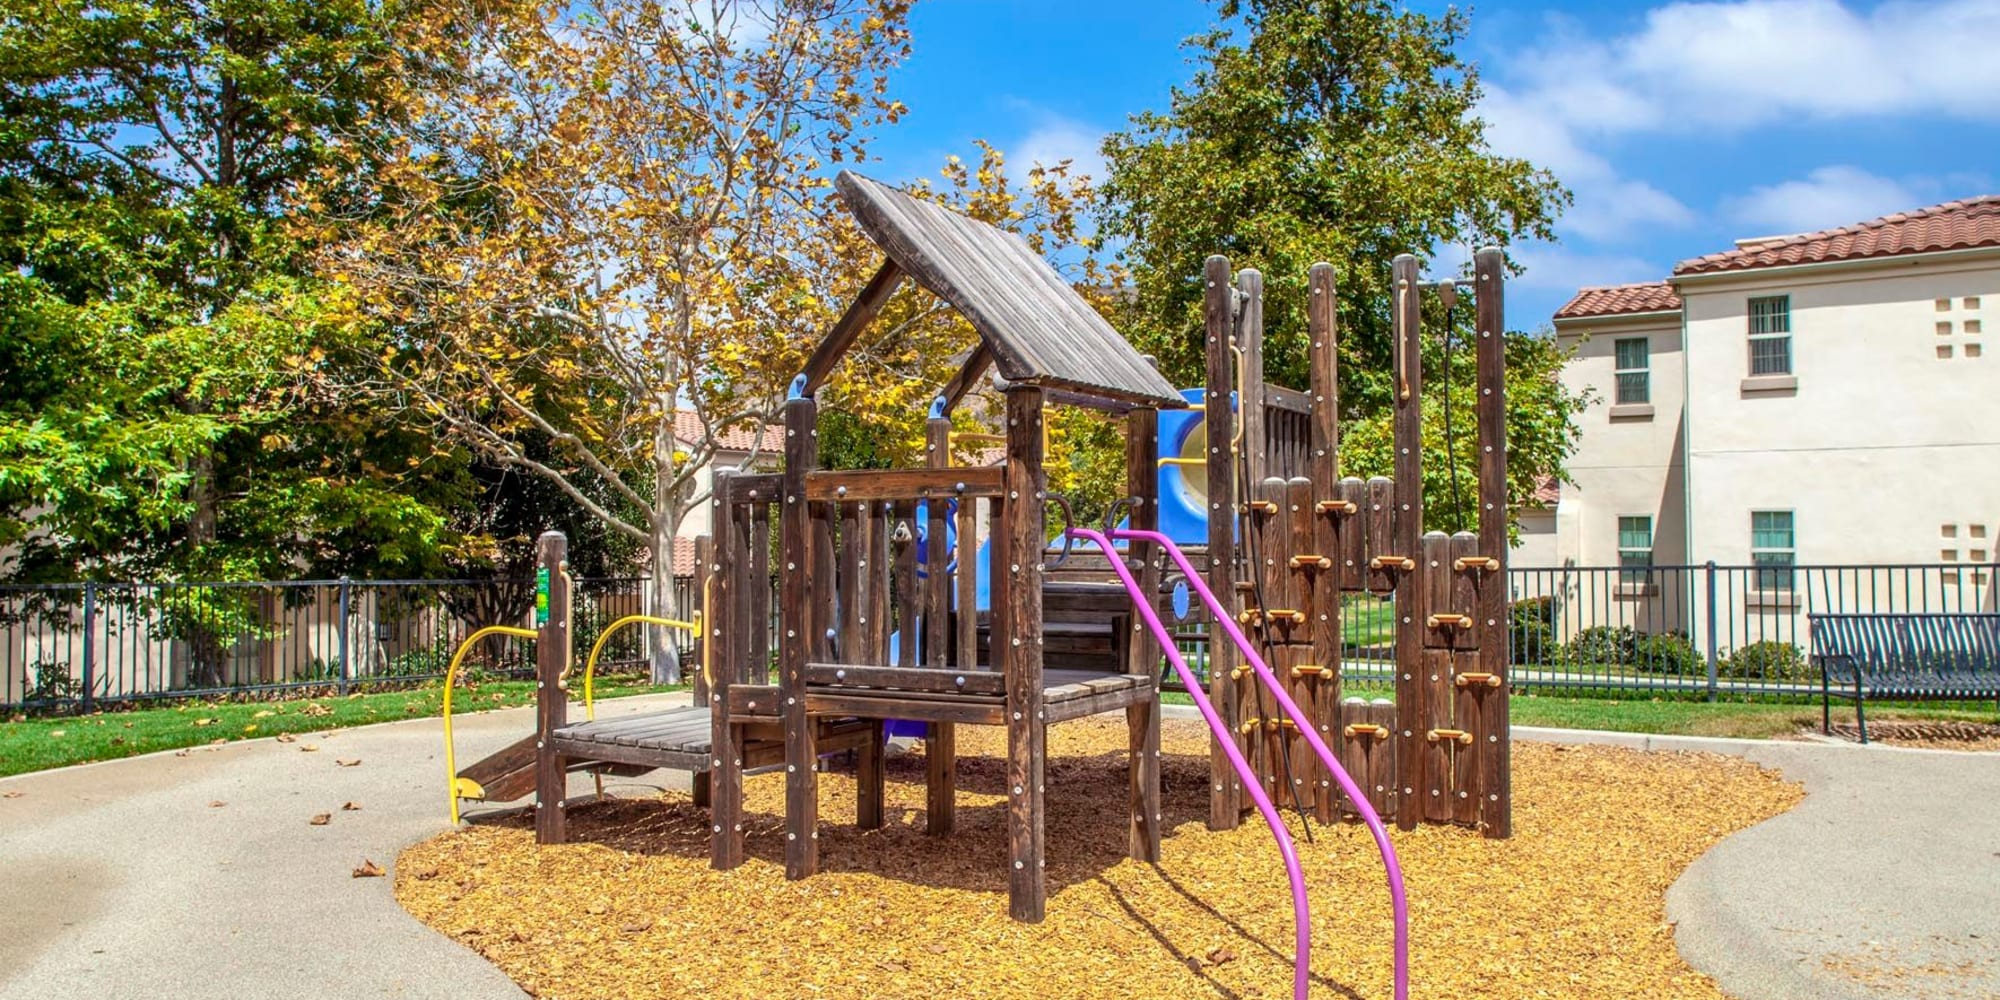 Onsite children's playground at Mission Hills in Camarillo, California